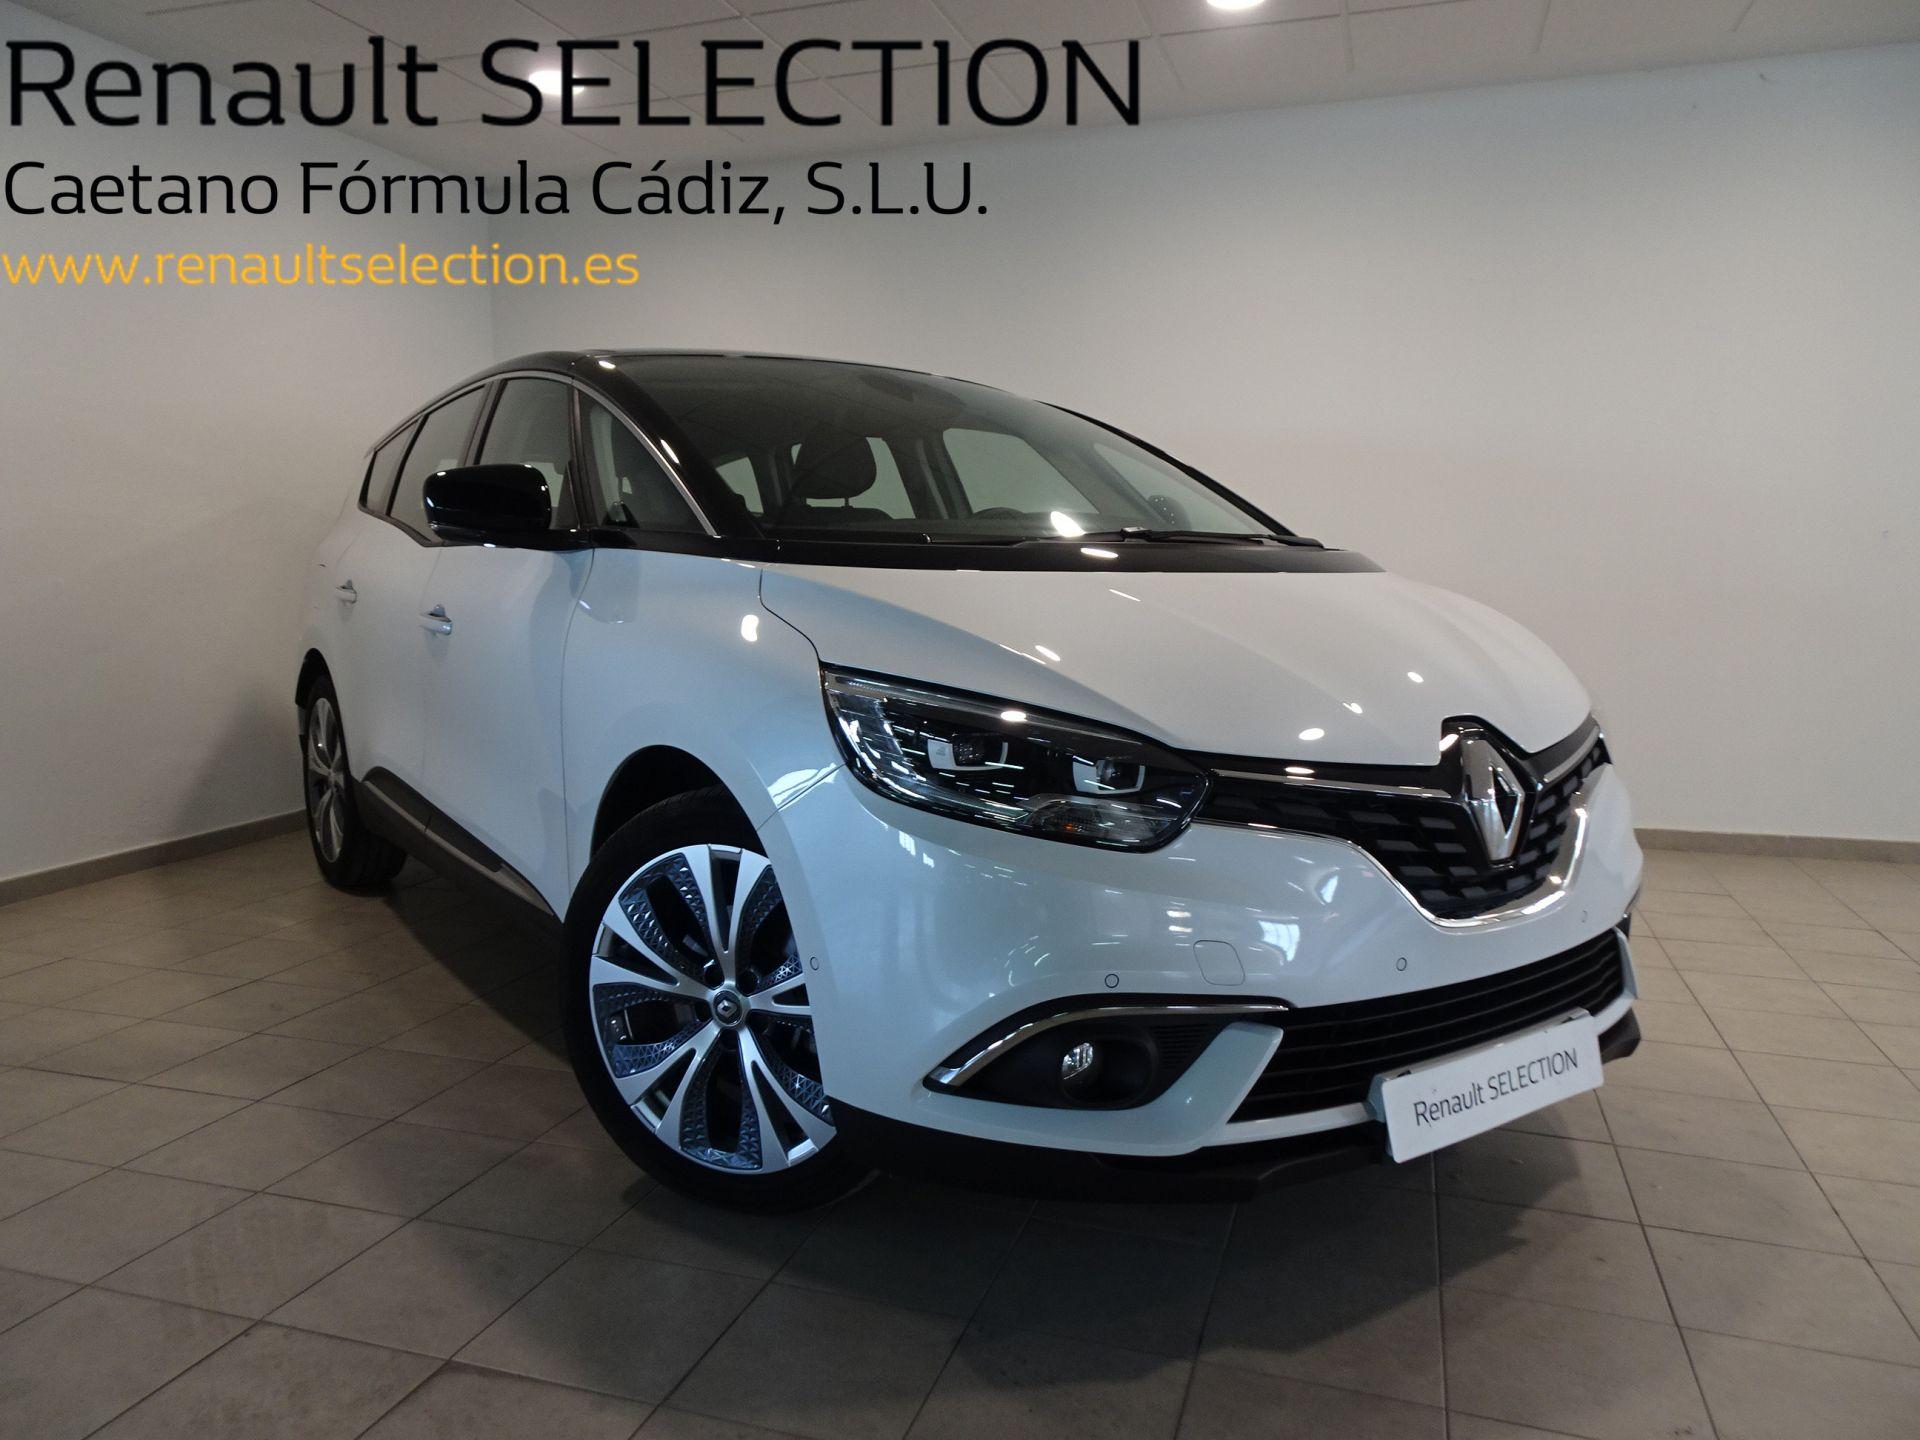 Renault Grand Scenic Zen GPF TCe 103kW (140CV) EDC - 18 segunda mano Cádiz